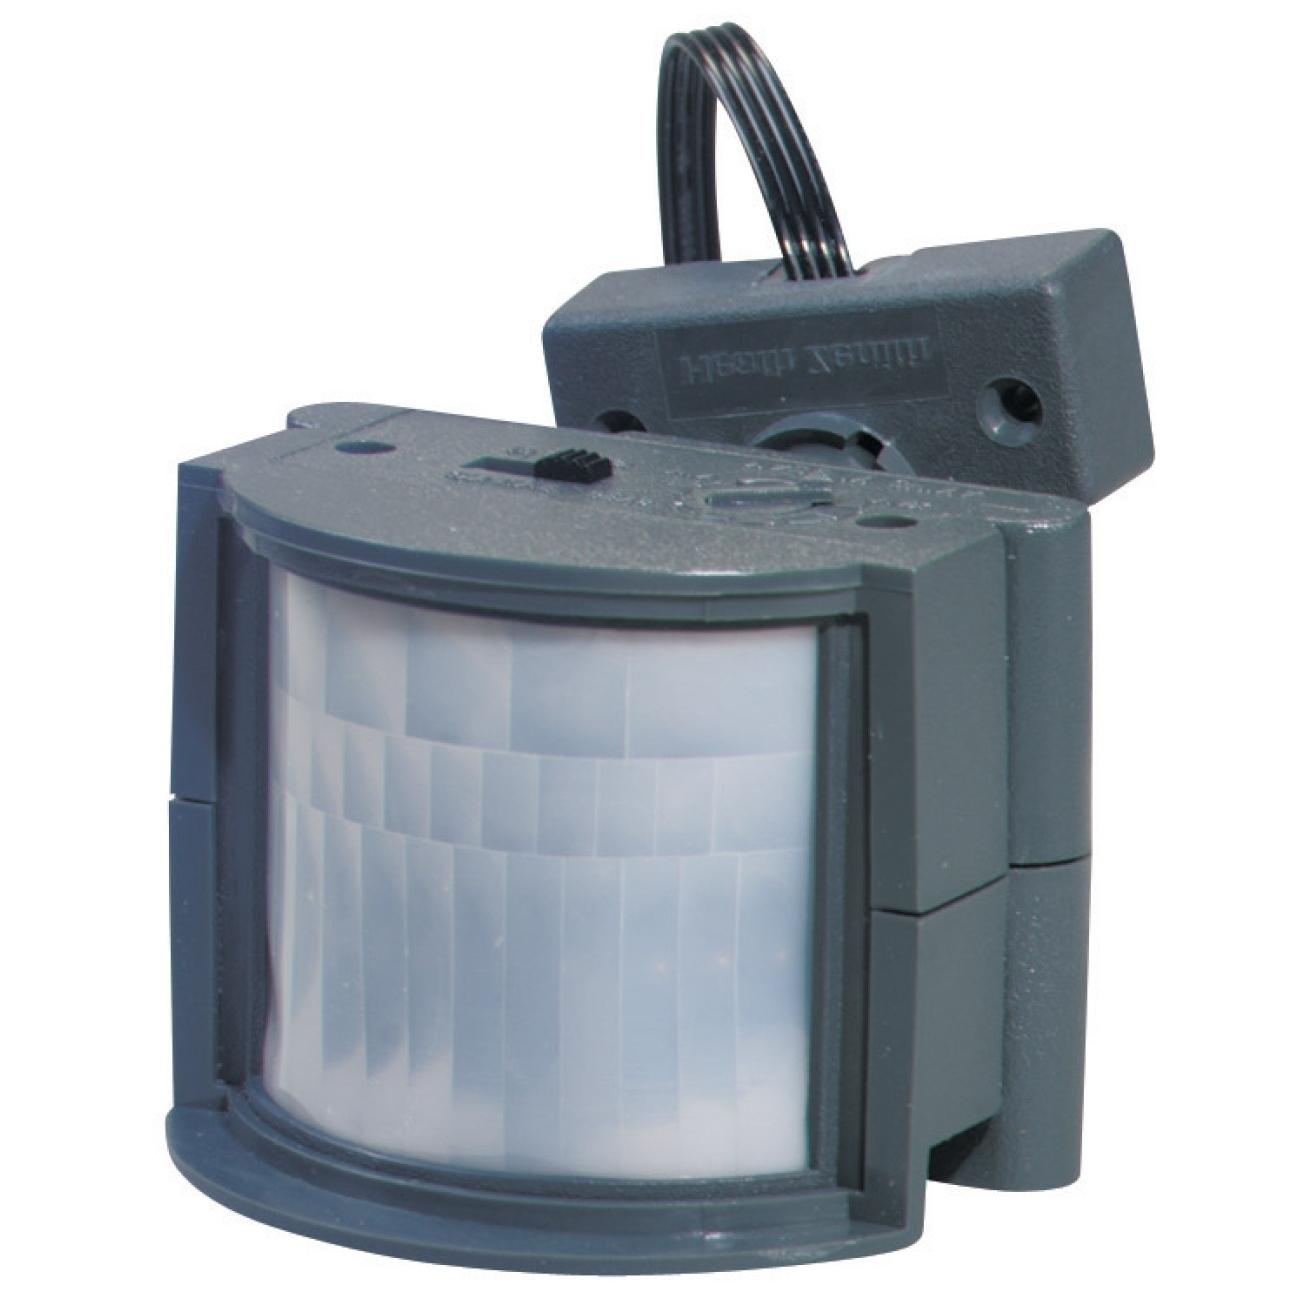 2019 Solar Spot Lights Outdoor Bunnings • Outdoor Lighting Pertaining To Outdoor Ceiling Lights At Bunnings (Gallery 18 of 20)